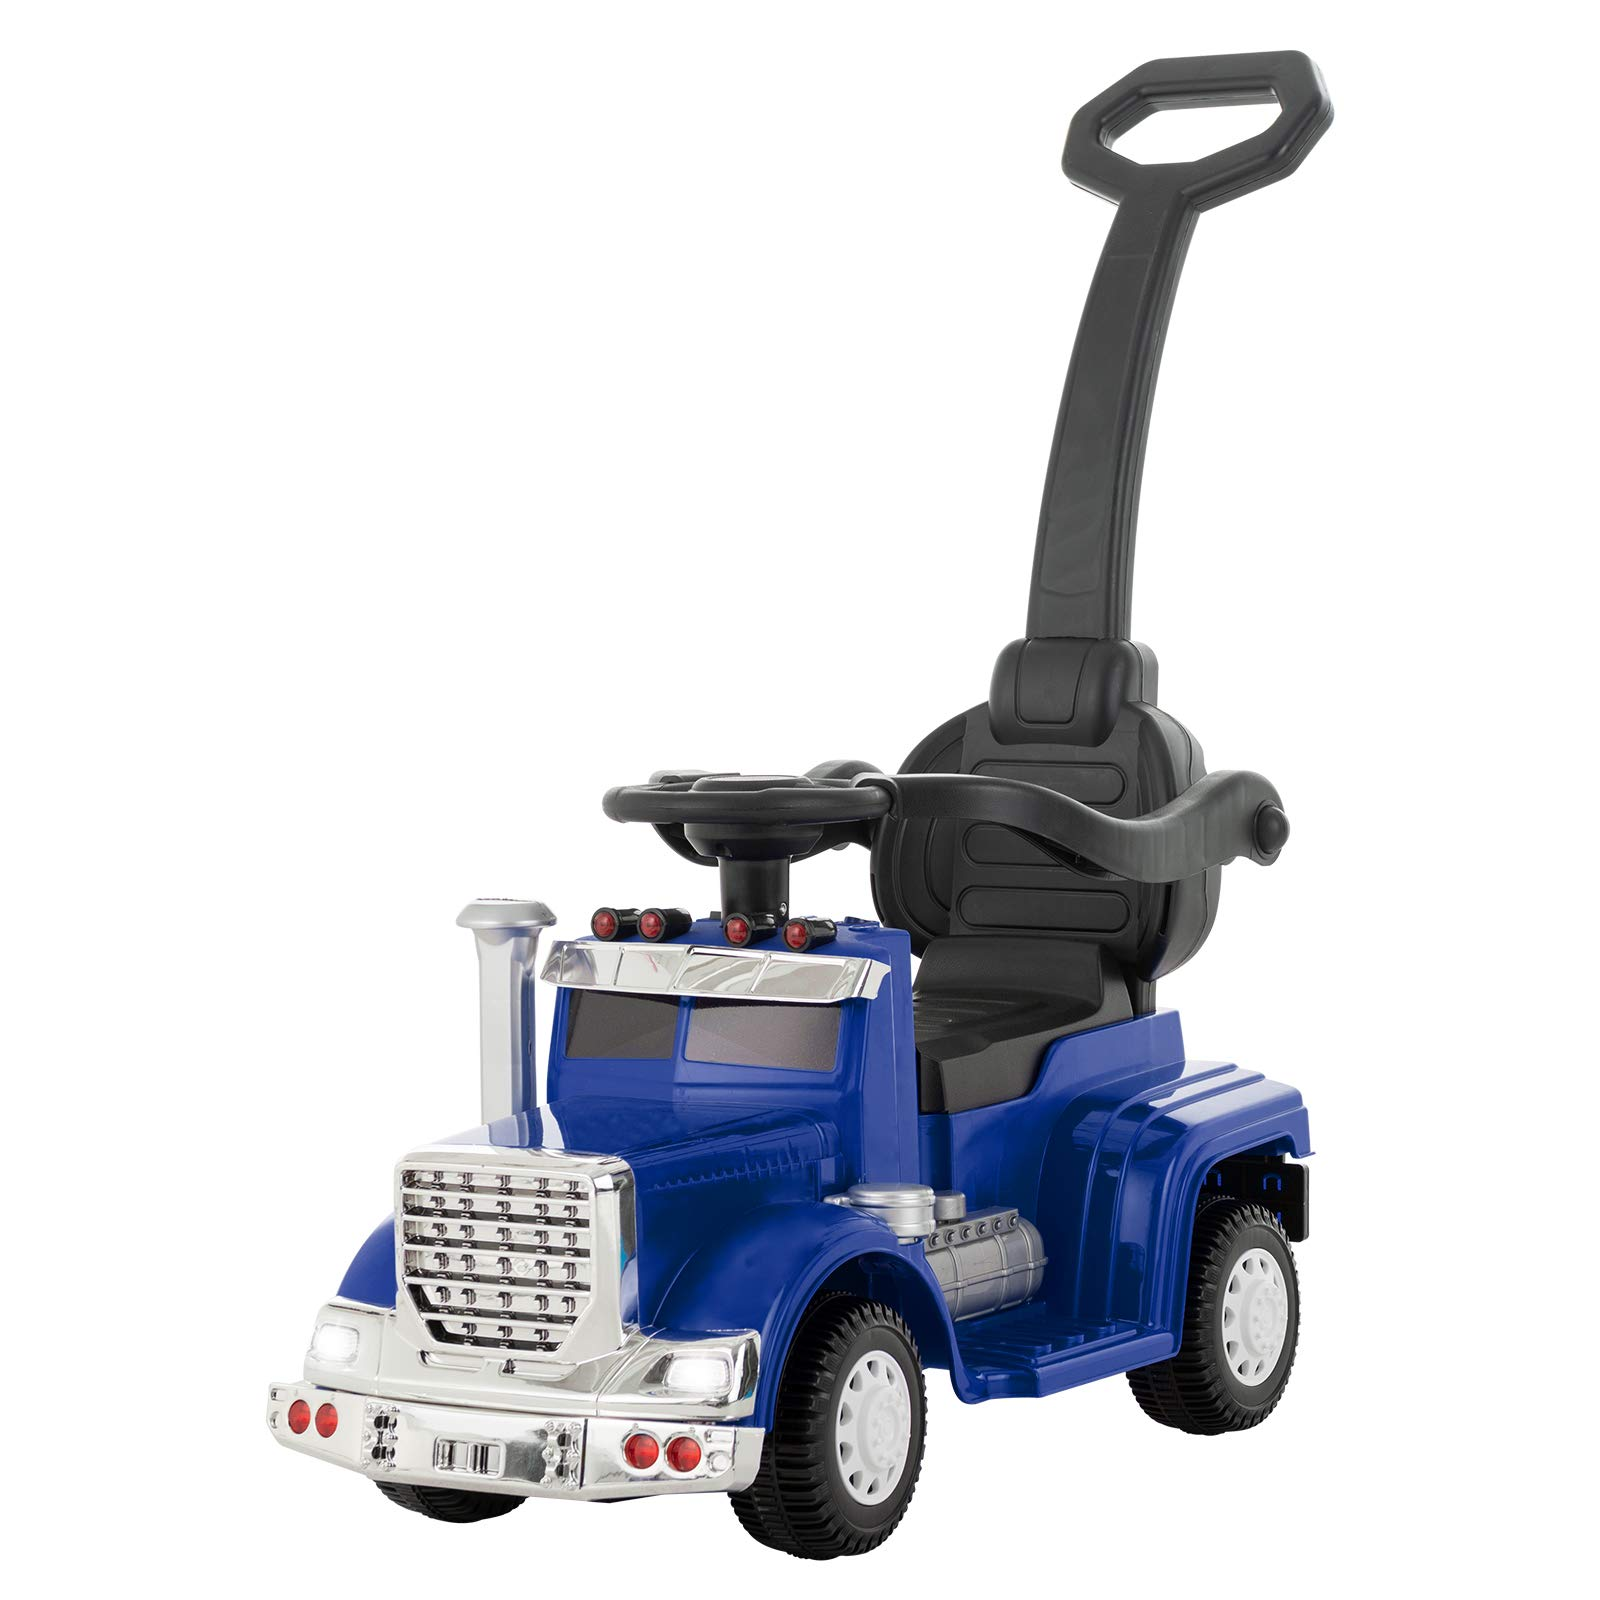 Uenjoy 6V Push Ride on Car 3 in 1 Convertible Baby Toddler Stroller, Battery Powered Kids Electric Vehicles, Parental Handle, Armrest Guardrails, LED Lights, Music, Horn, Blue